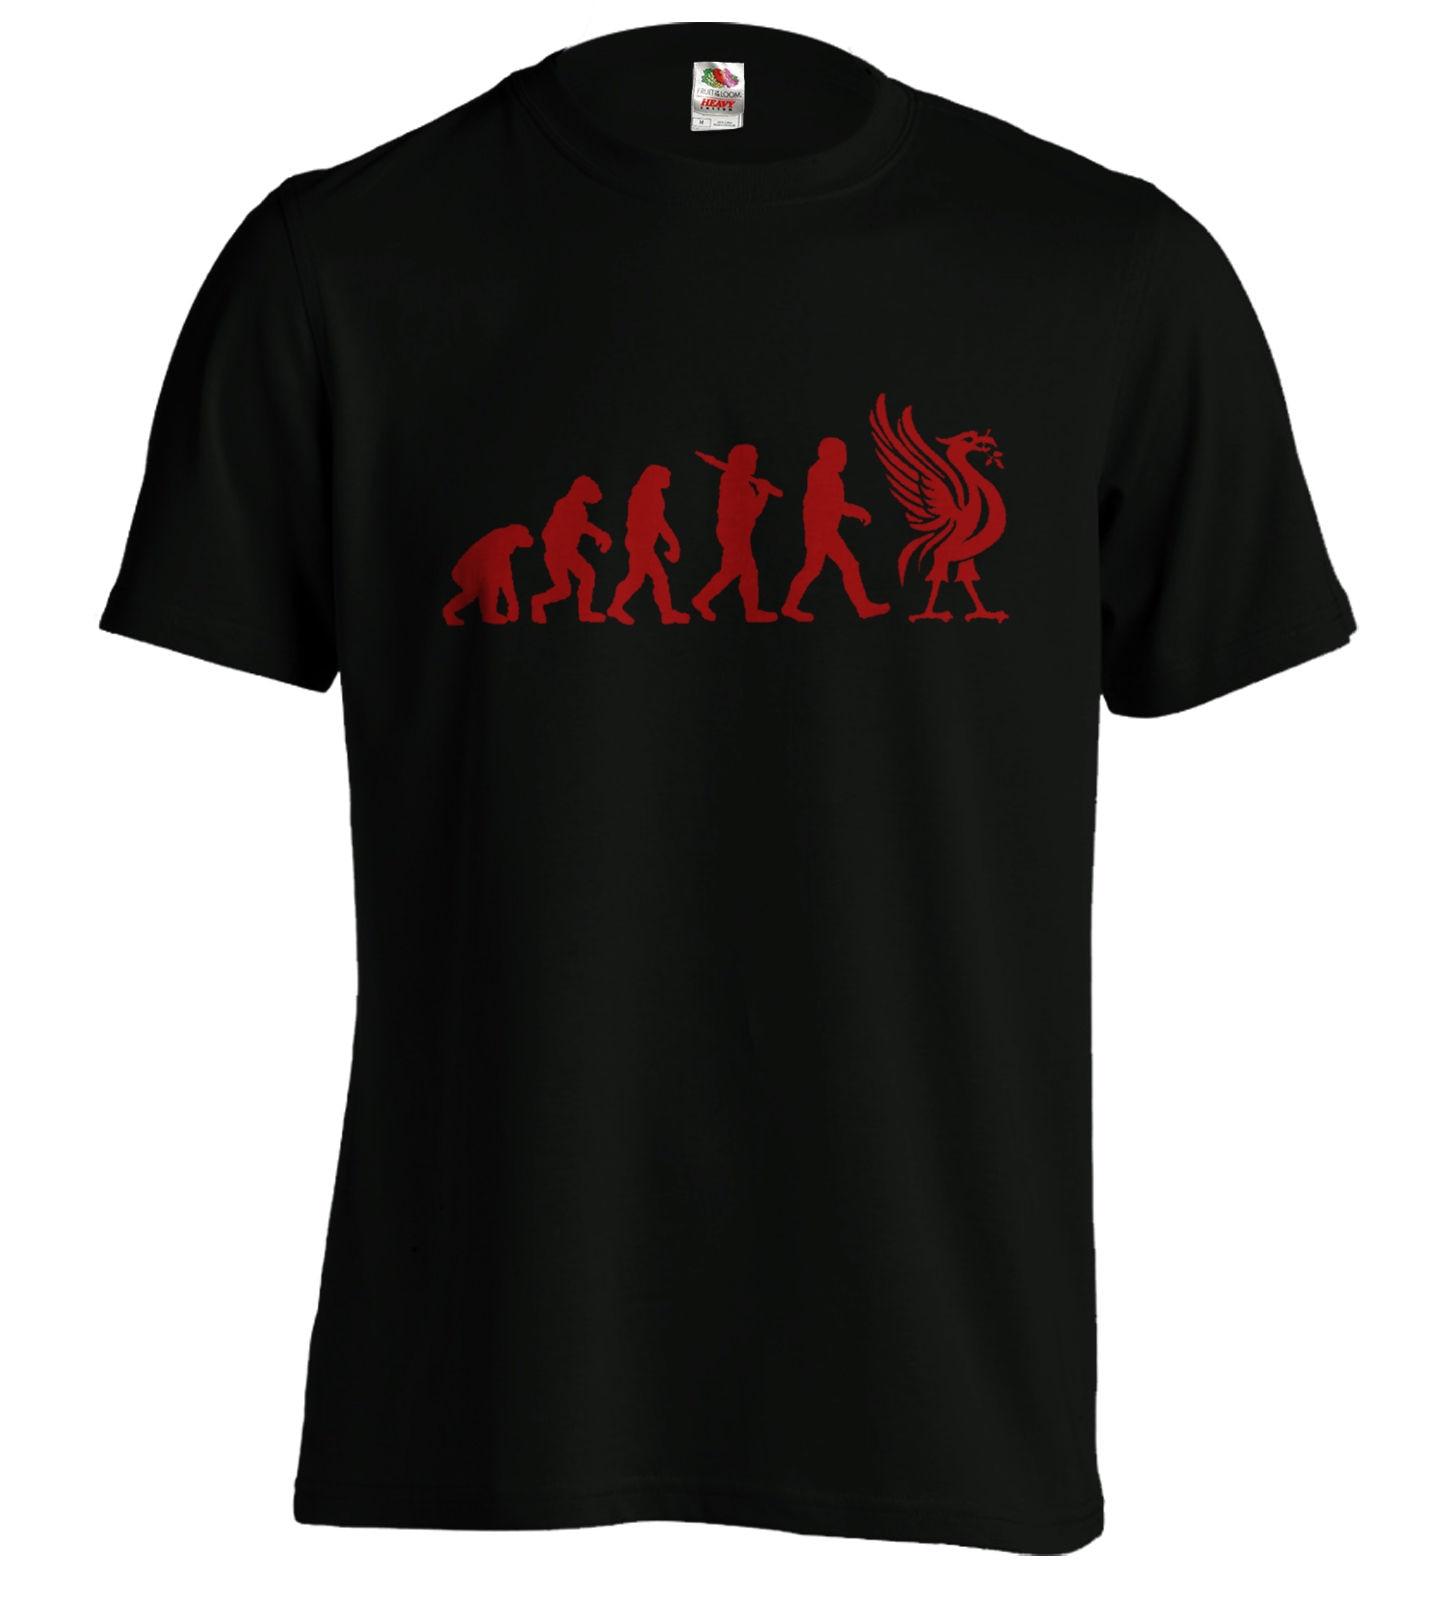 4c30bbc3 Liverpool Evolution T-Shirt Liver Bird Tee Funny T Xmas Birthday Present  New T Shirts